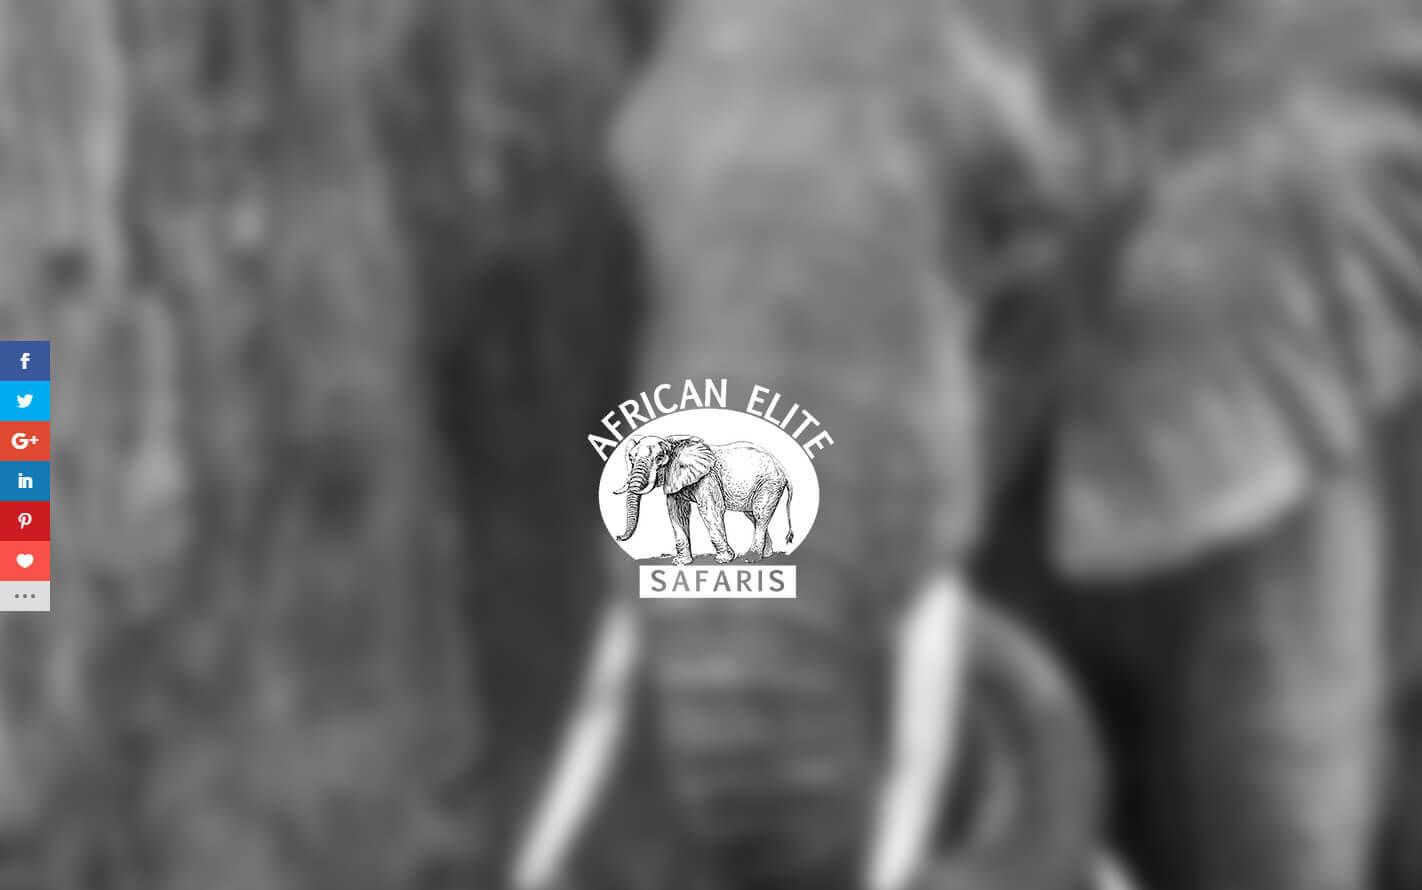 African Elite Safaris